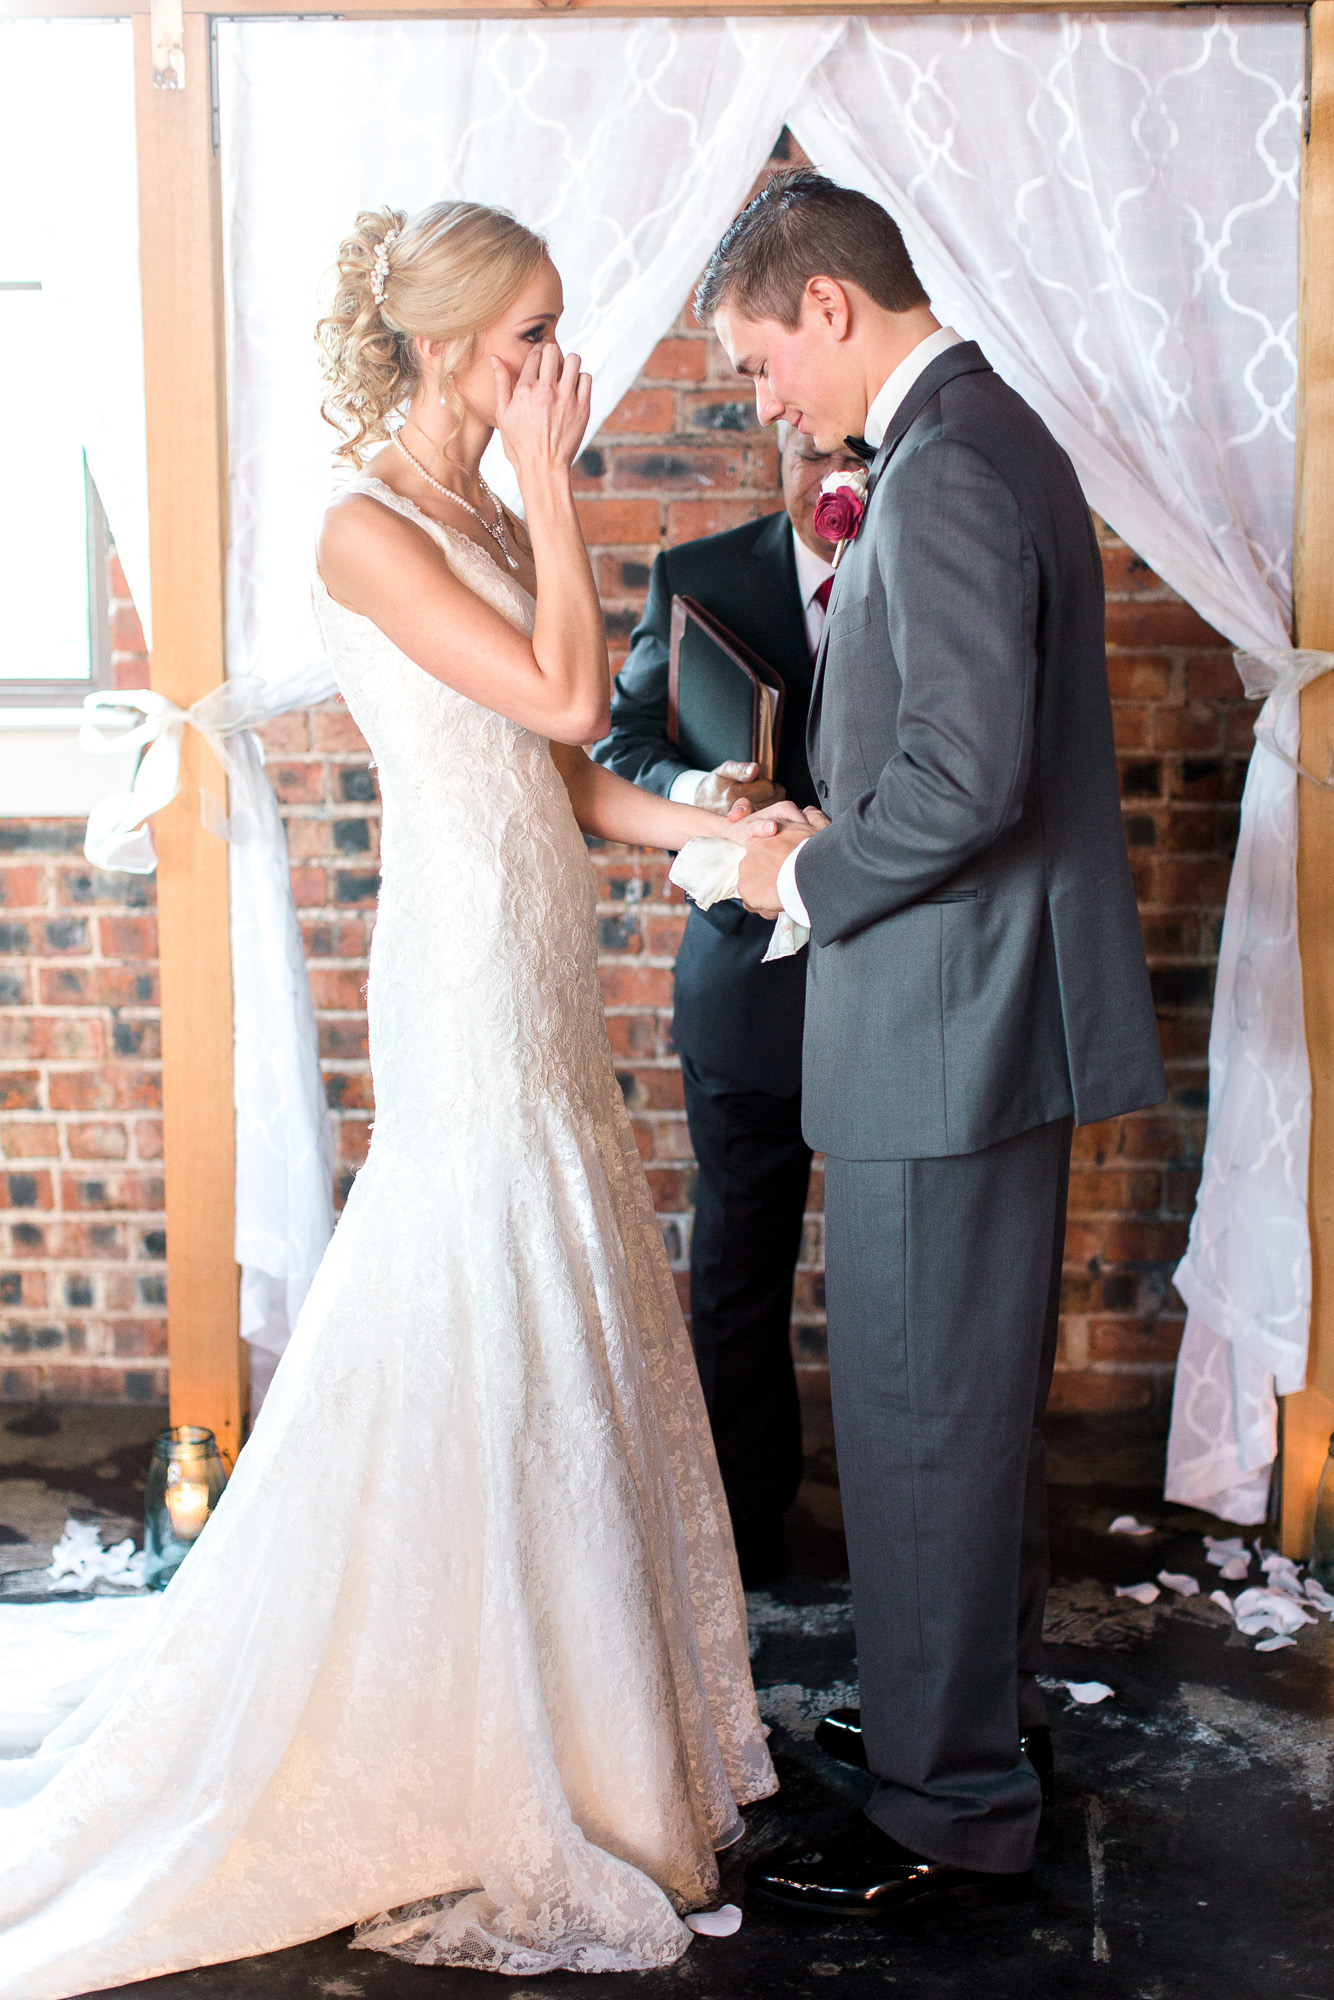 932f6-downtown-bryan-weddingdowntown-bryan-wedding.jpg